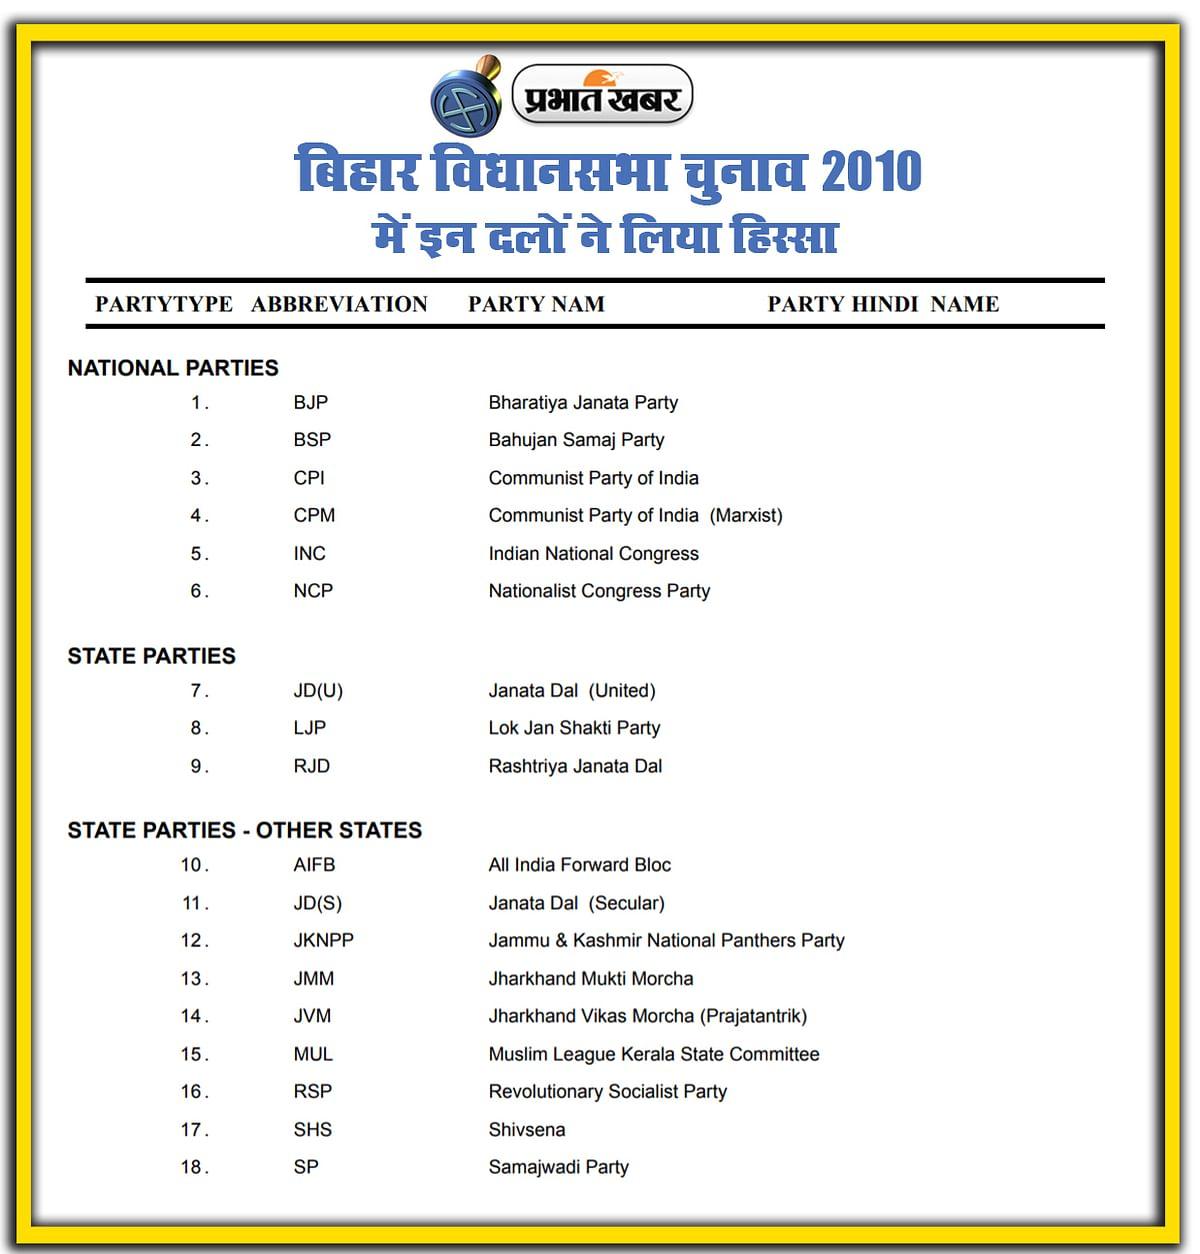 bihar vidhan sabha chunav 2010, National, State, Local Parties in Election